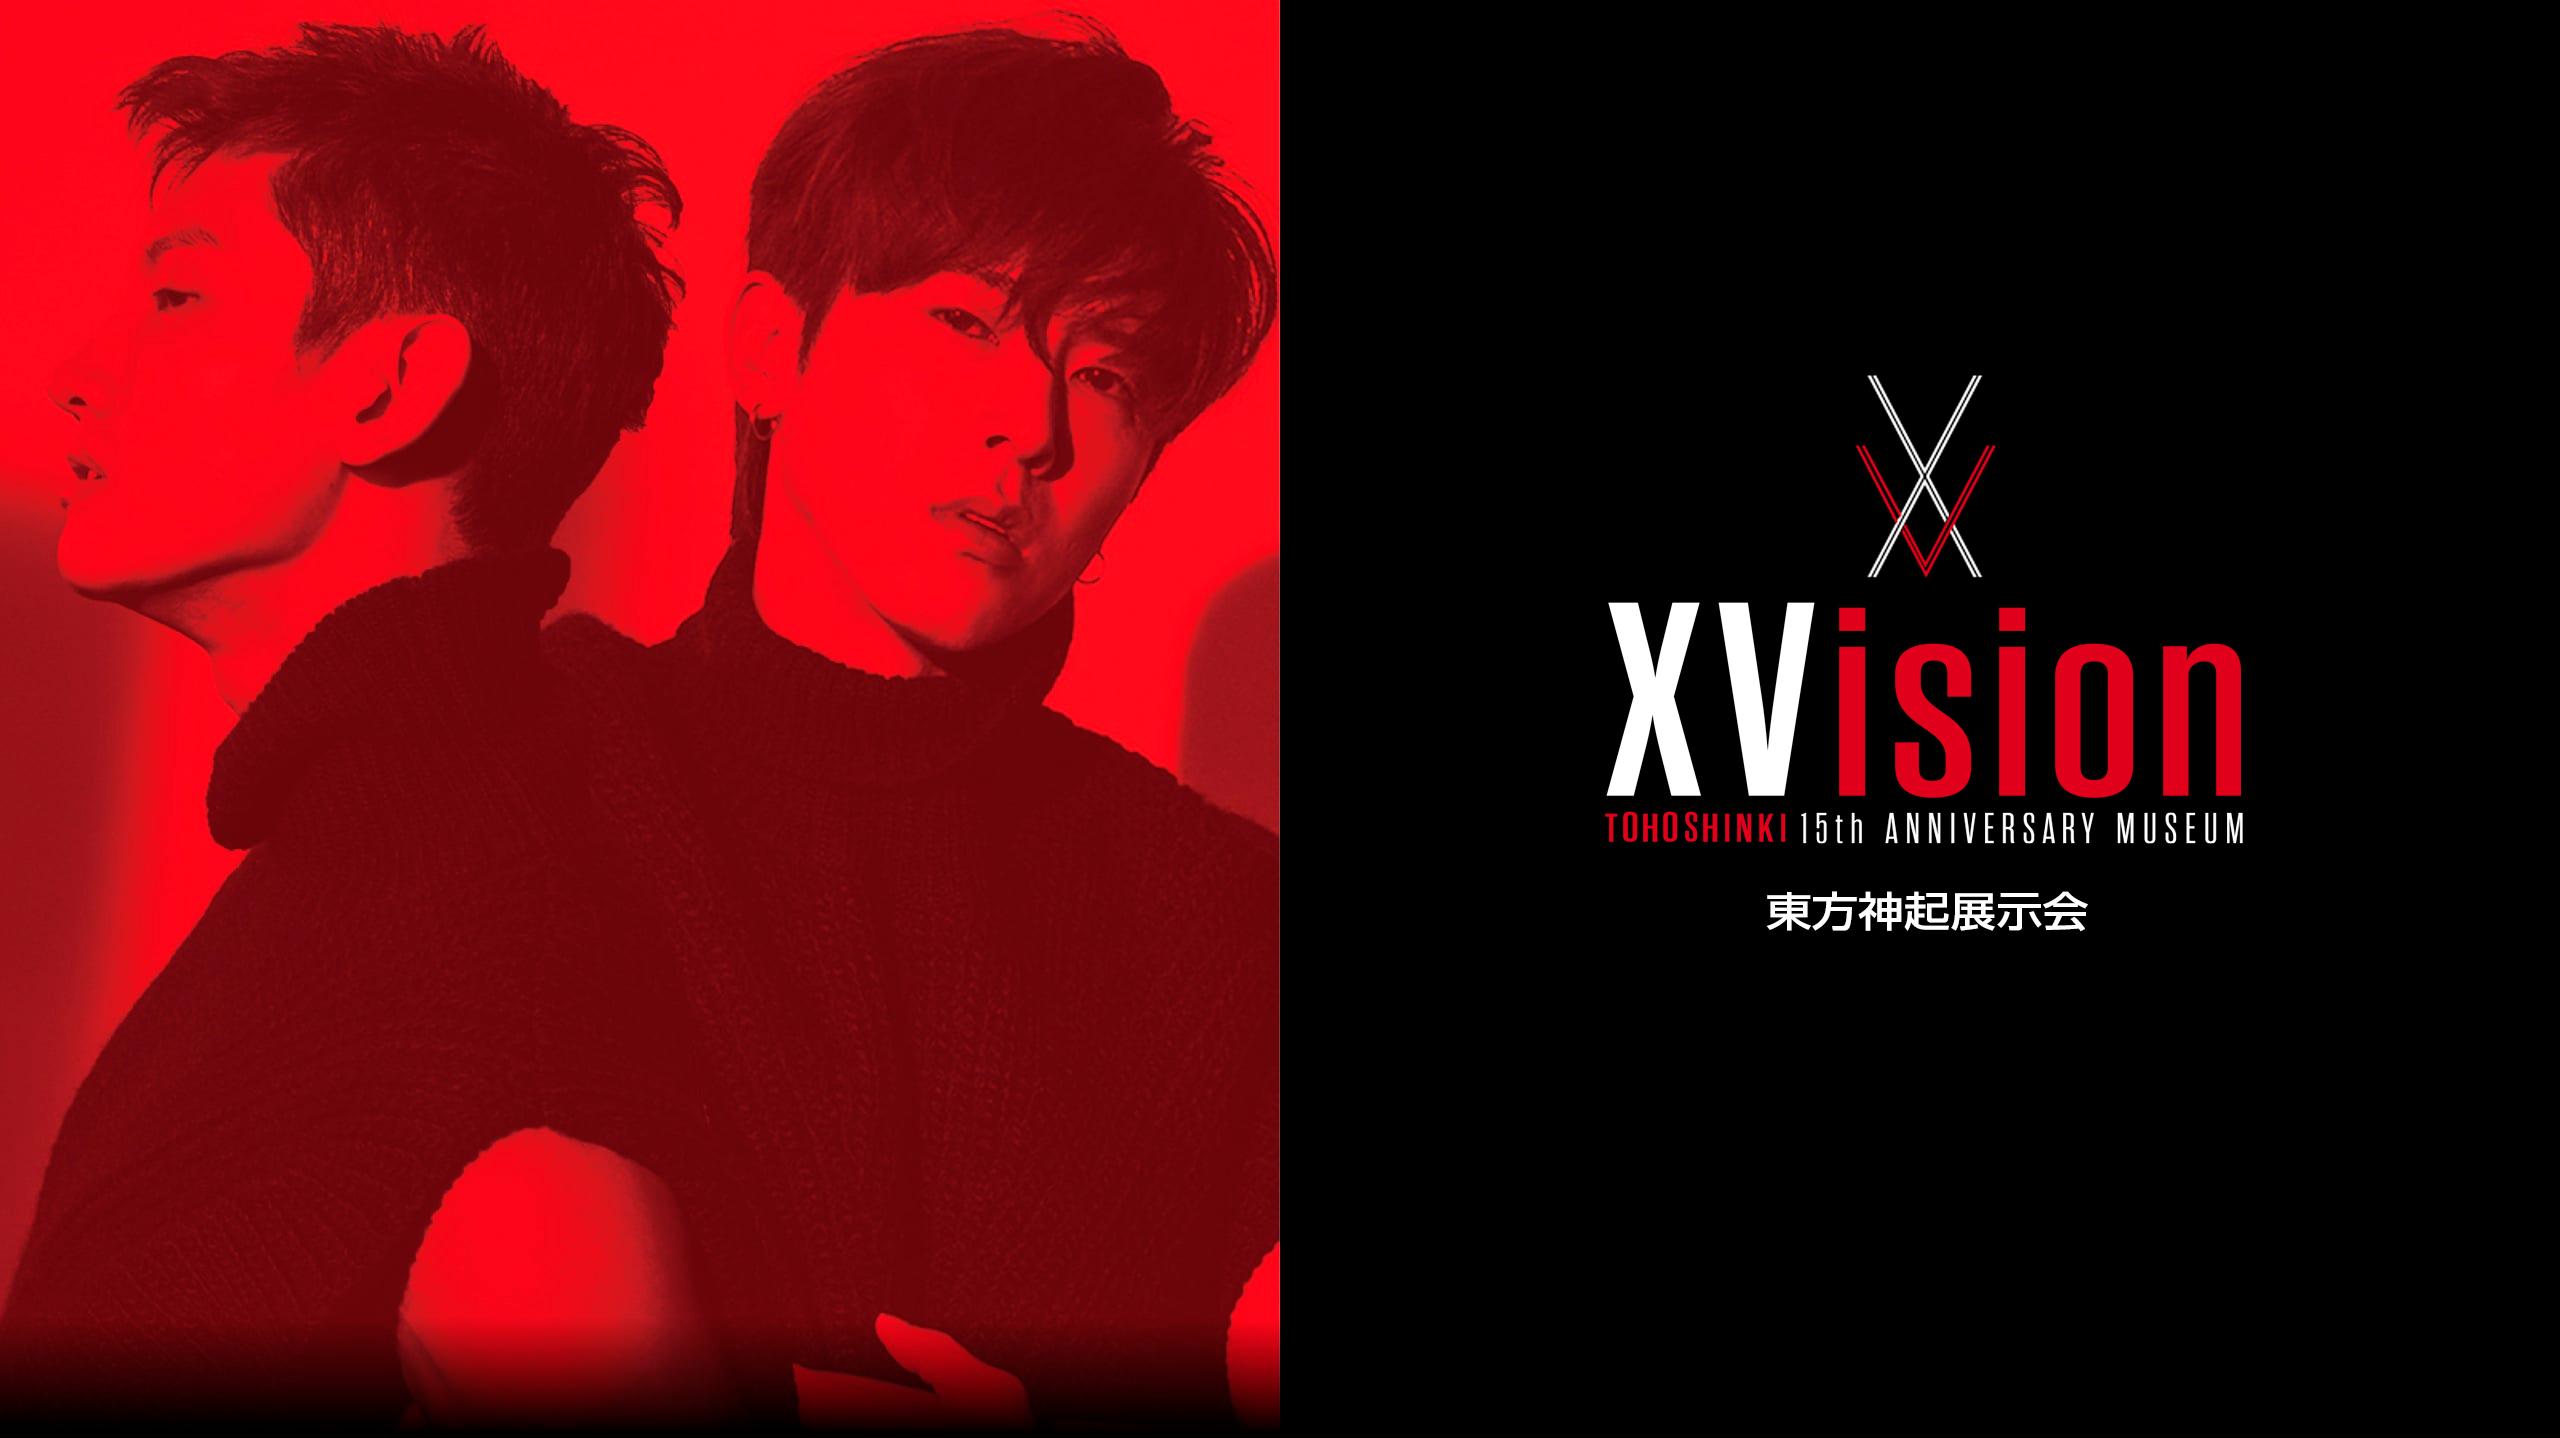 "【名古屋会場】TOHOSHINKI 15th ANNIVERSARY MUSEUM ""XVision"" 2月25日分入場券"